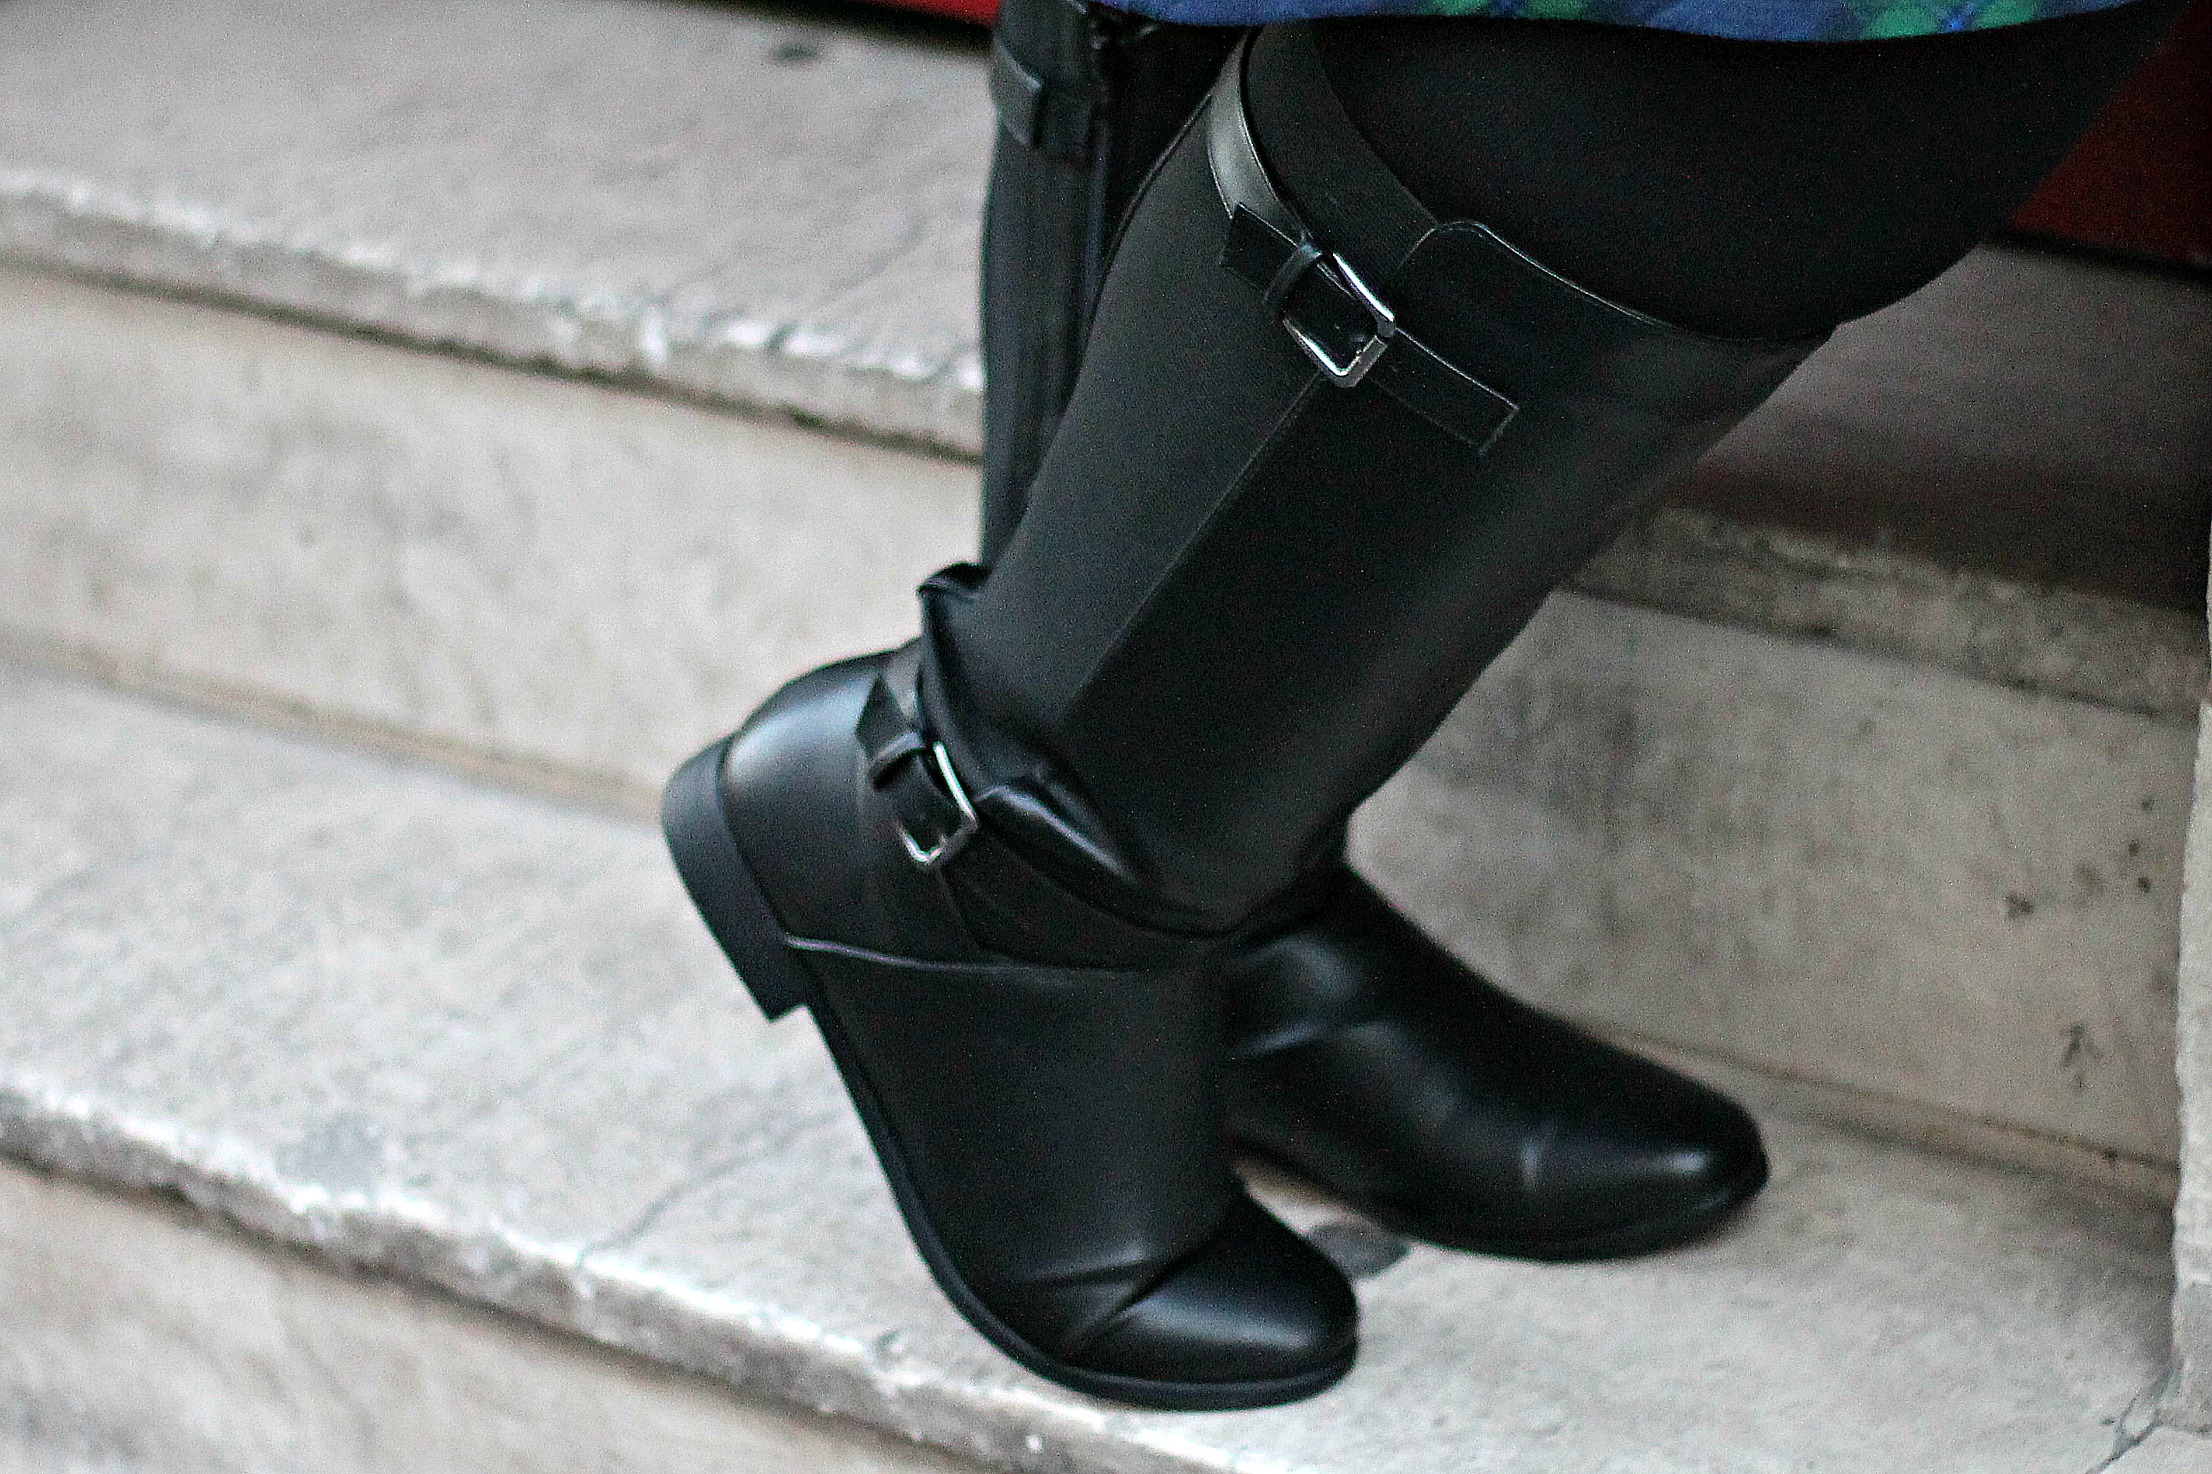 date de sortie e6594 56872 Chaussures femmes grandes pointures chaussures grande taille ...